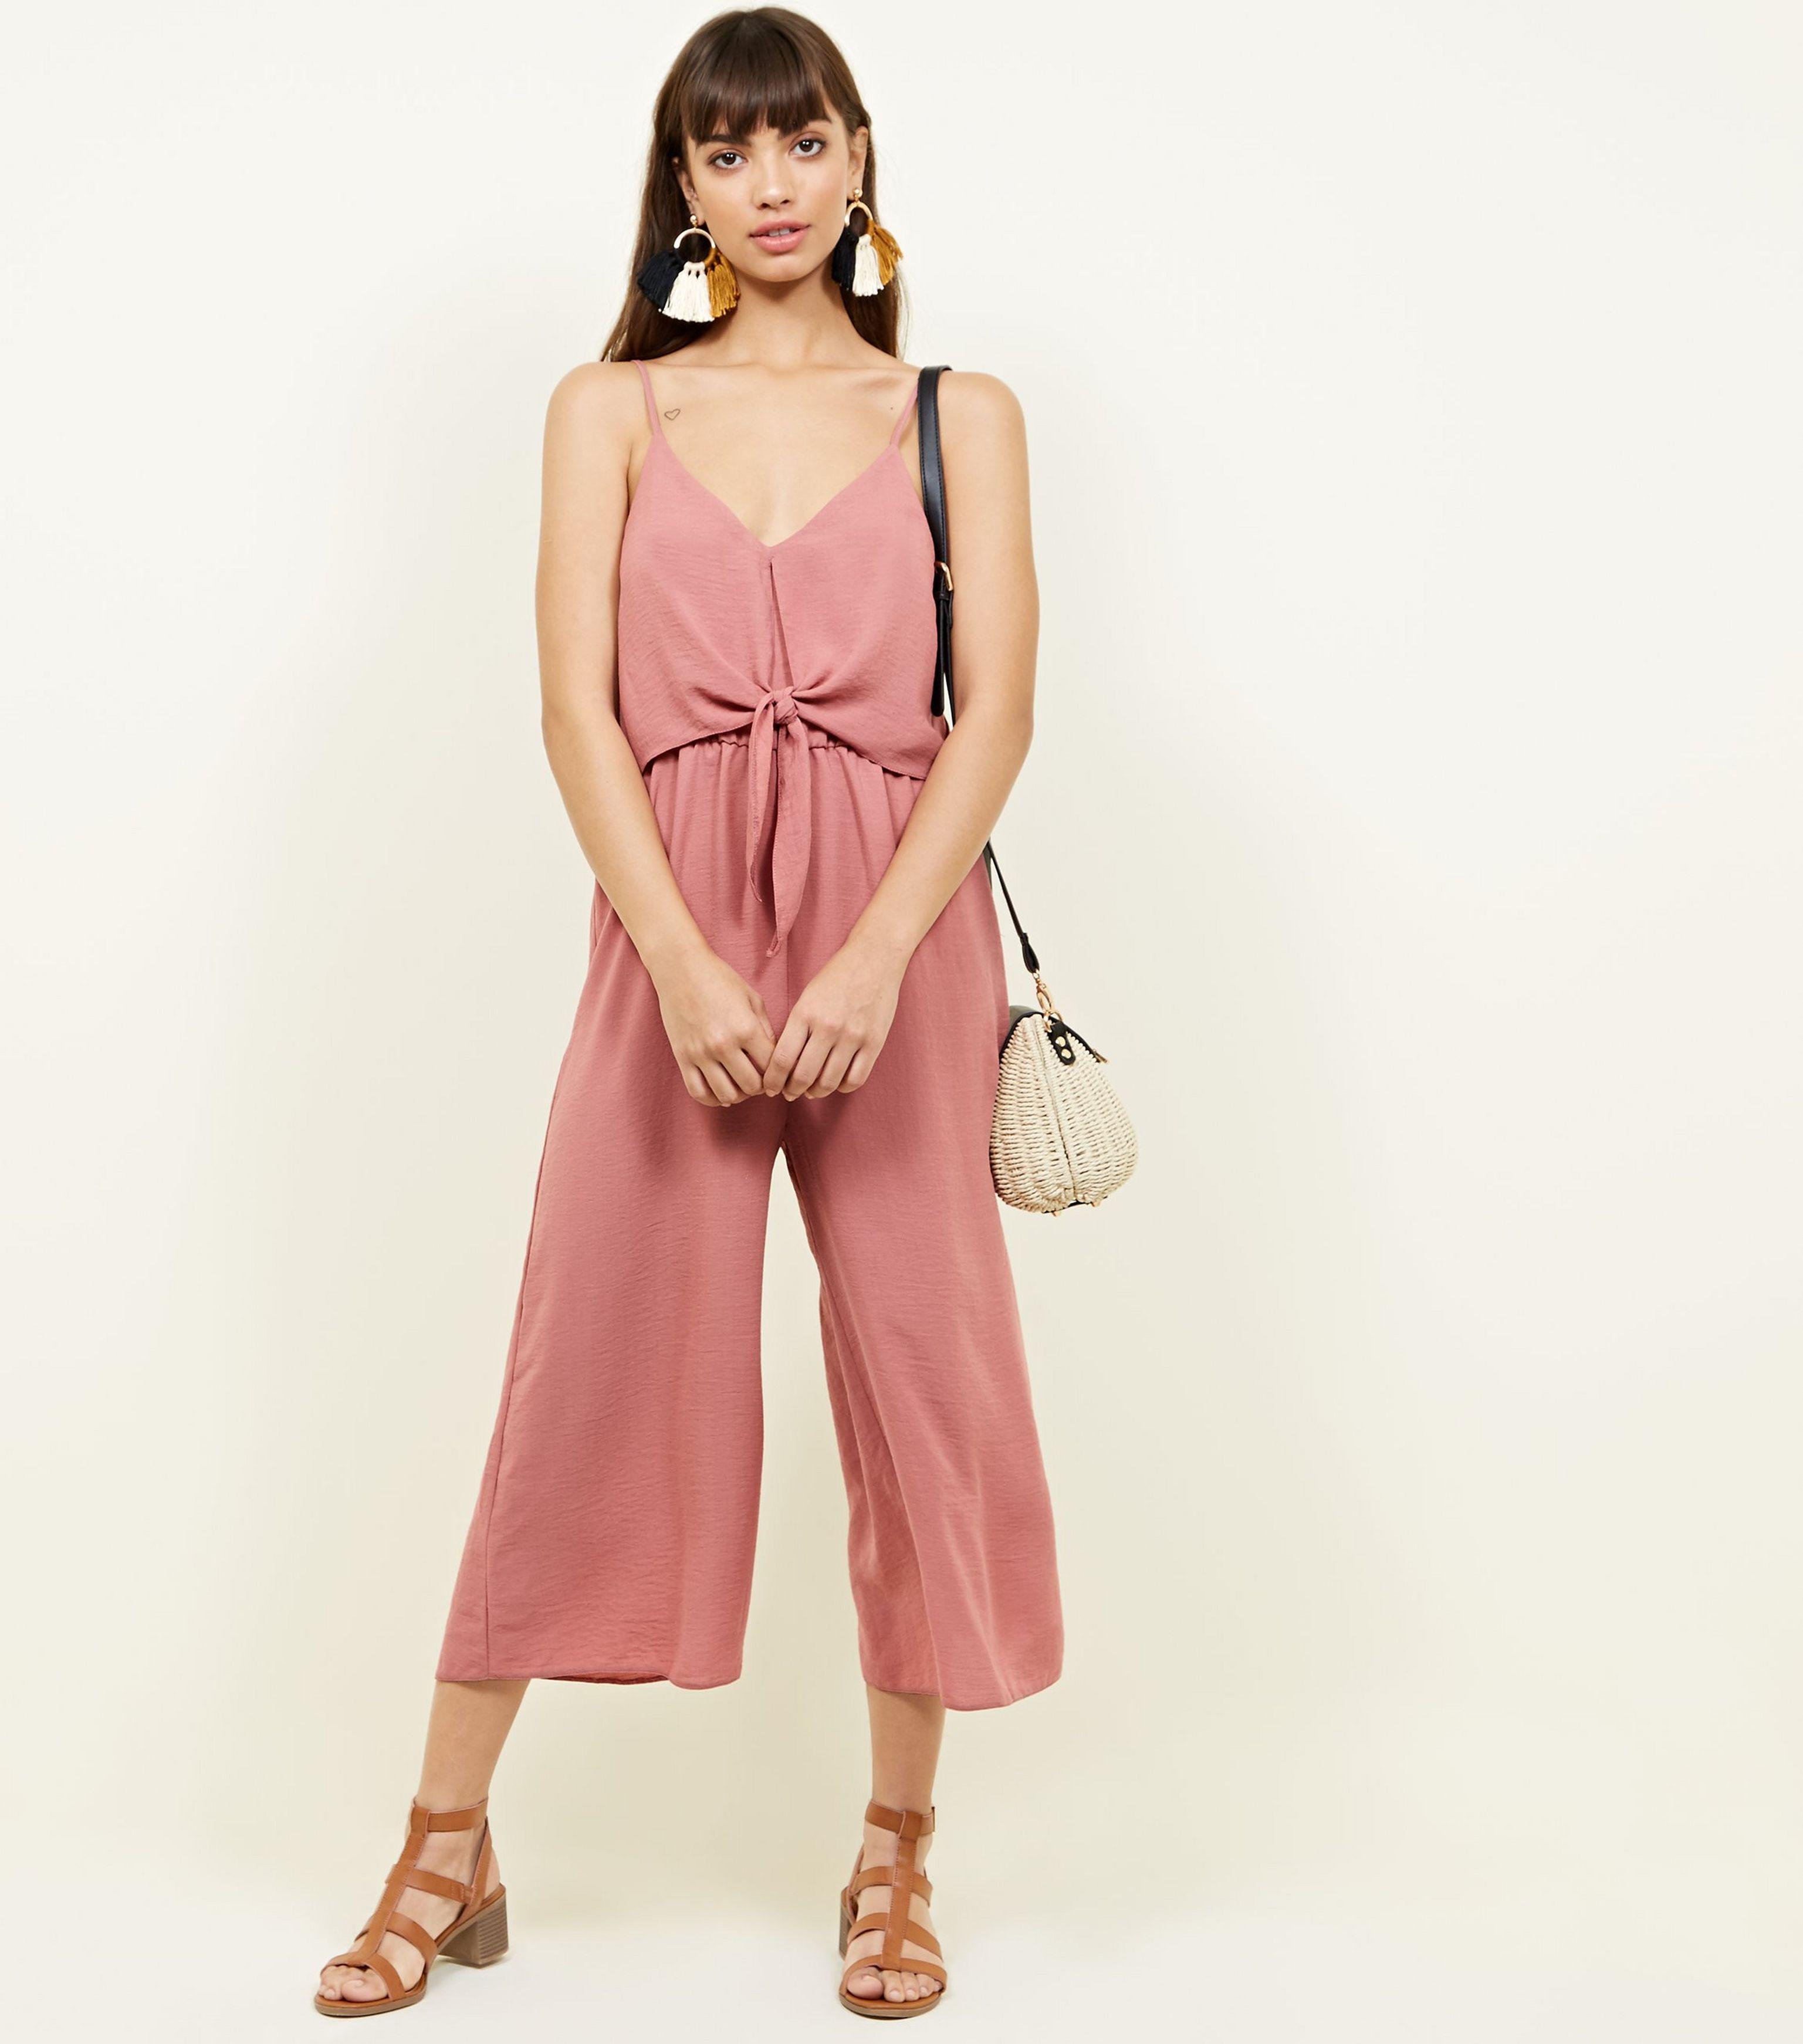 9fdba911295ad New Look Mid Pink Tie Front Linen-look Jumpsuit in Pink - Lyst